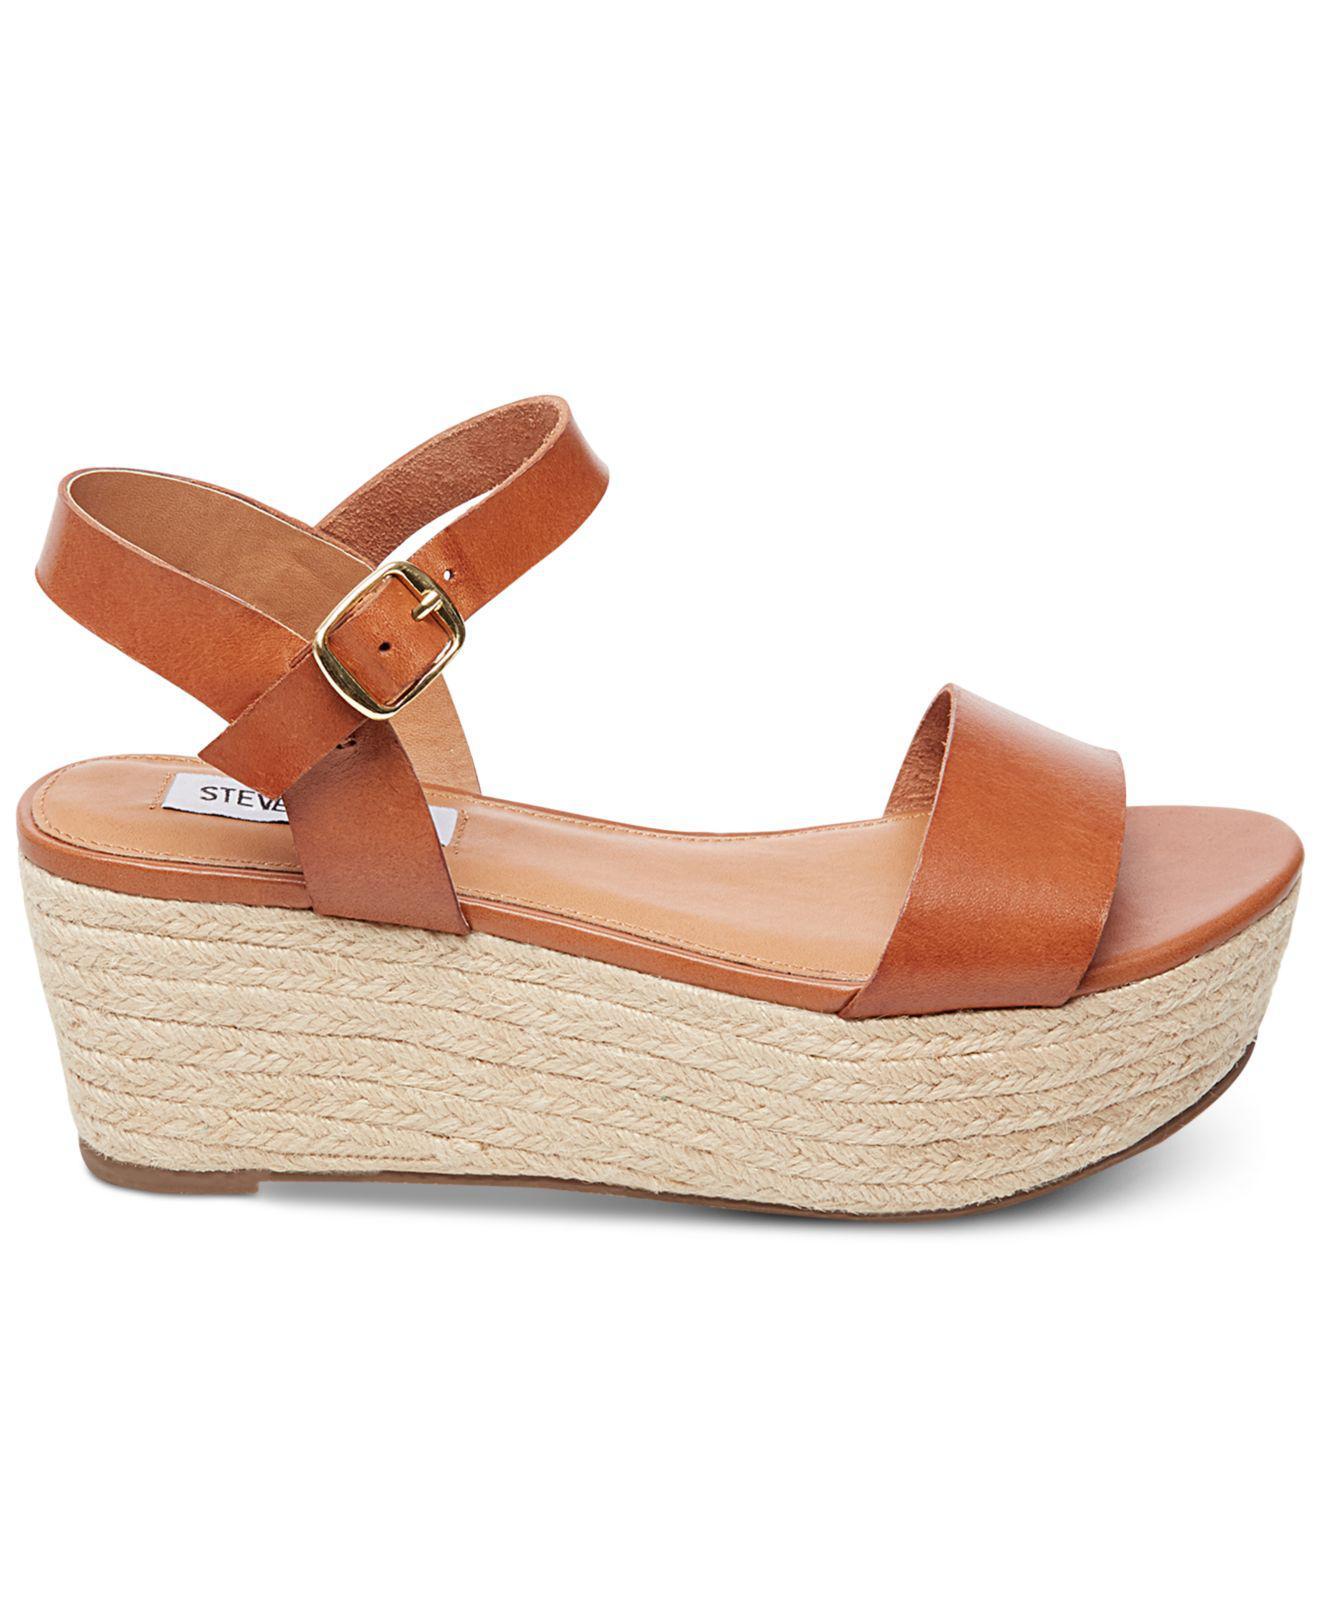 12df99b4c3fb Lyst - Steve Madden Busy Espadrille Wedge Sandals in Brown